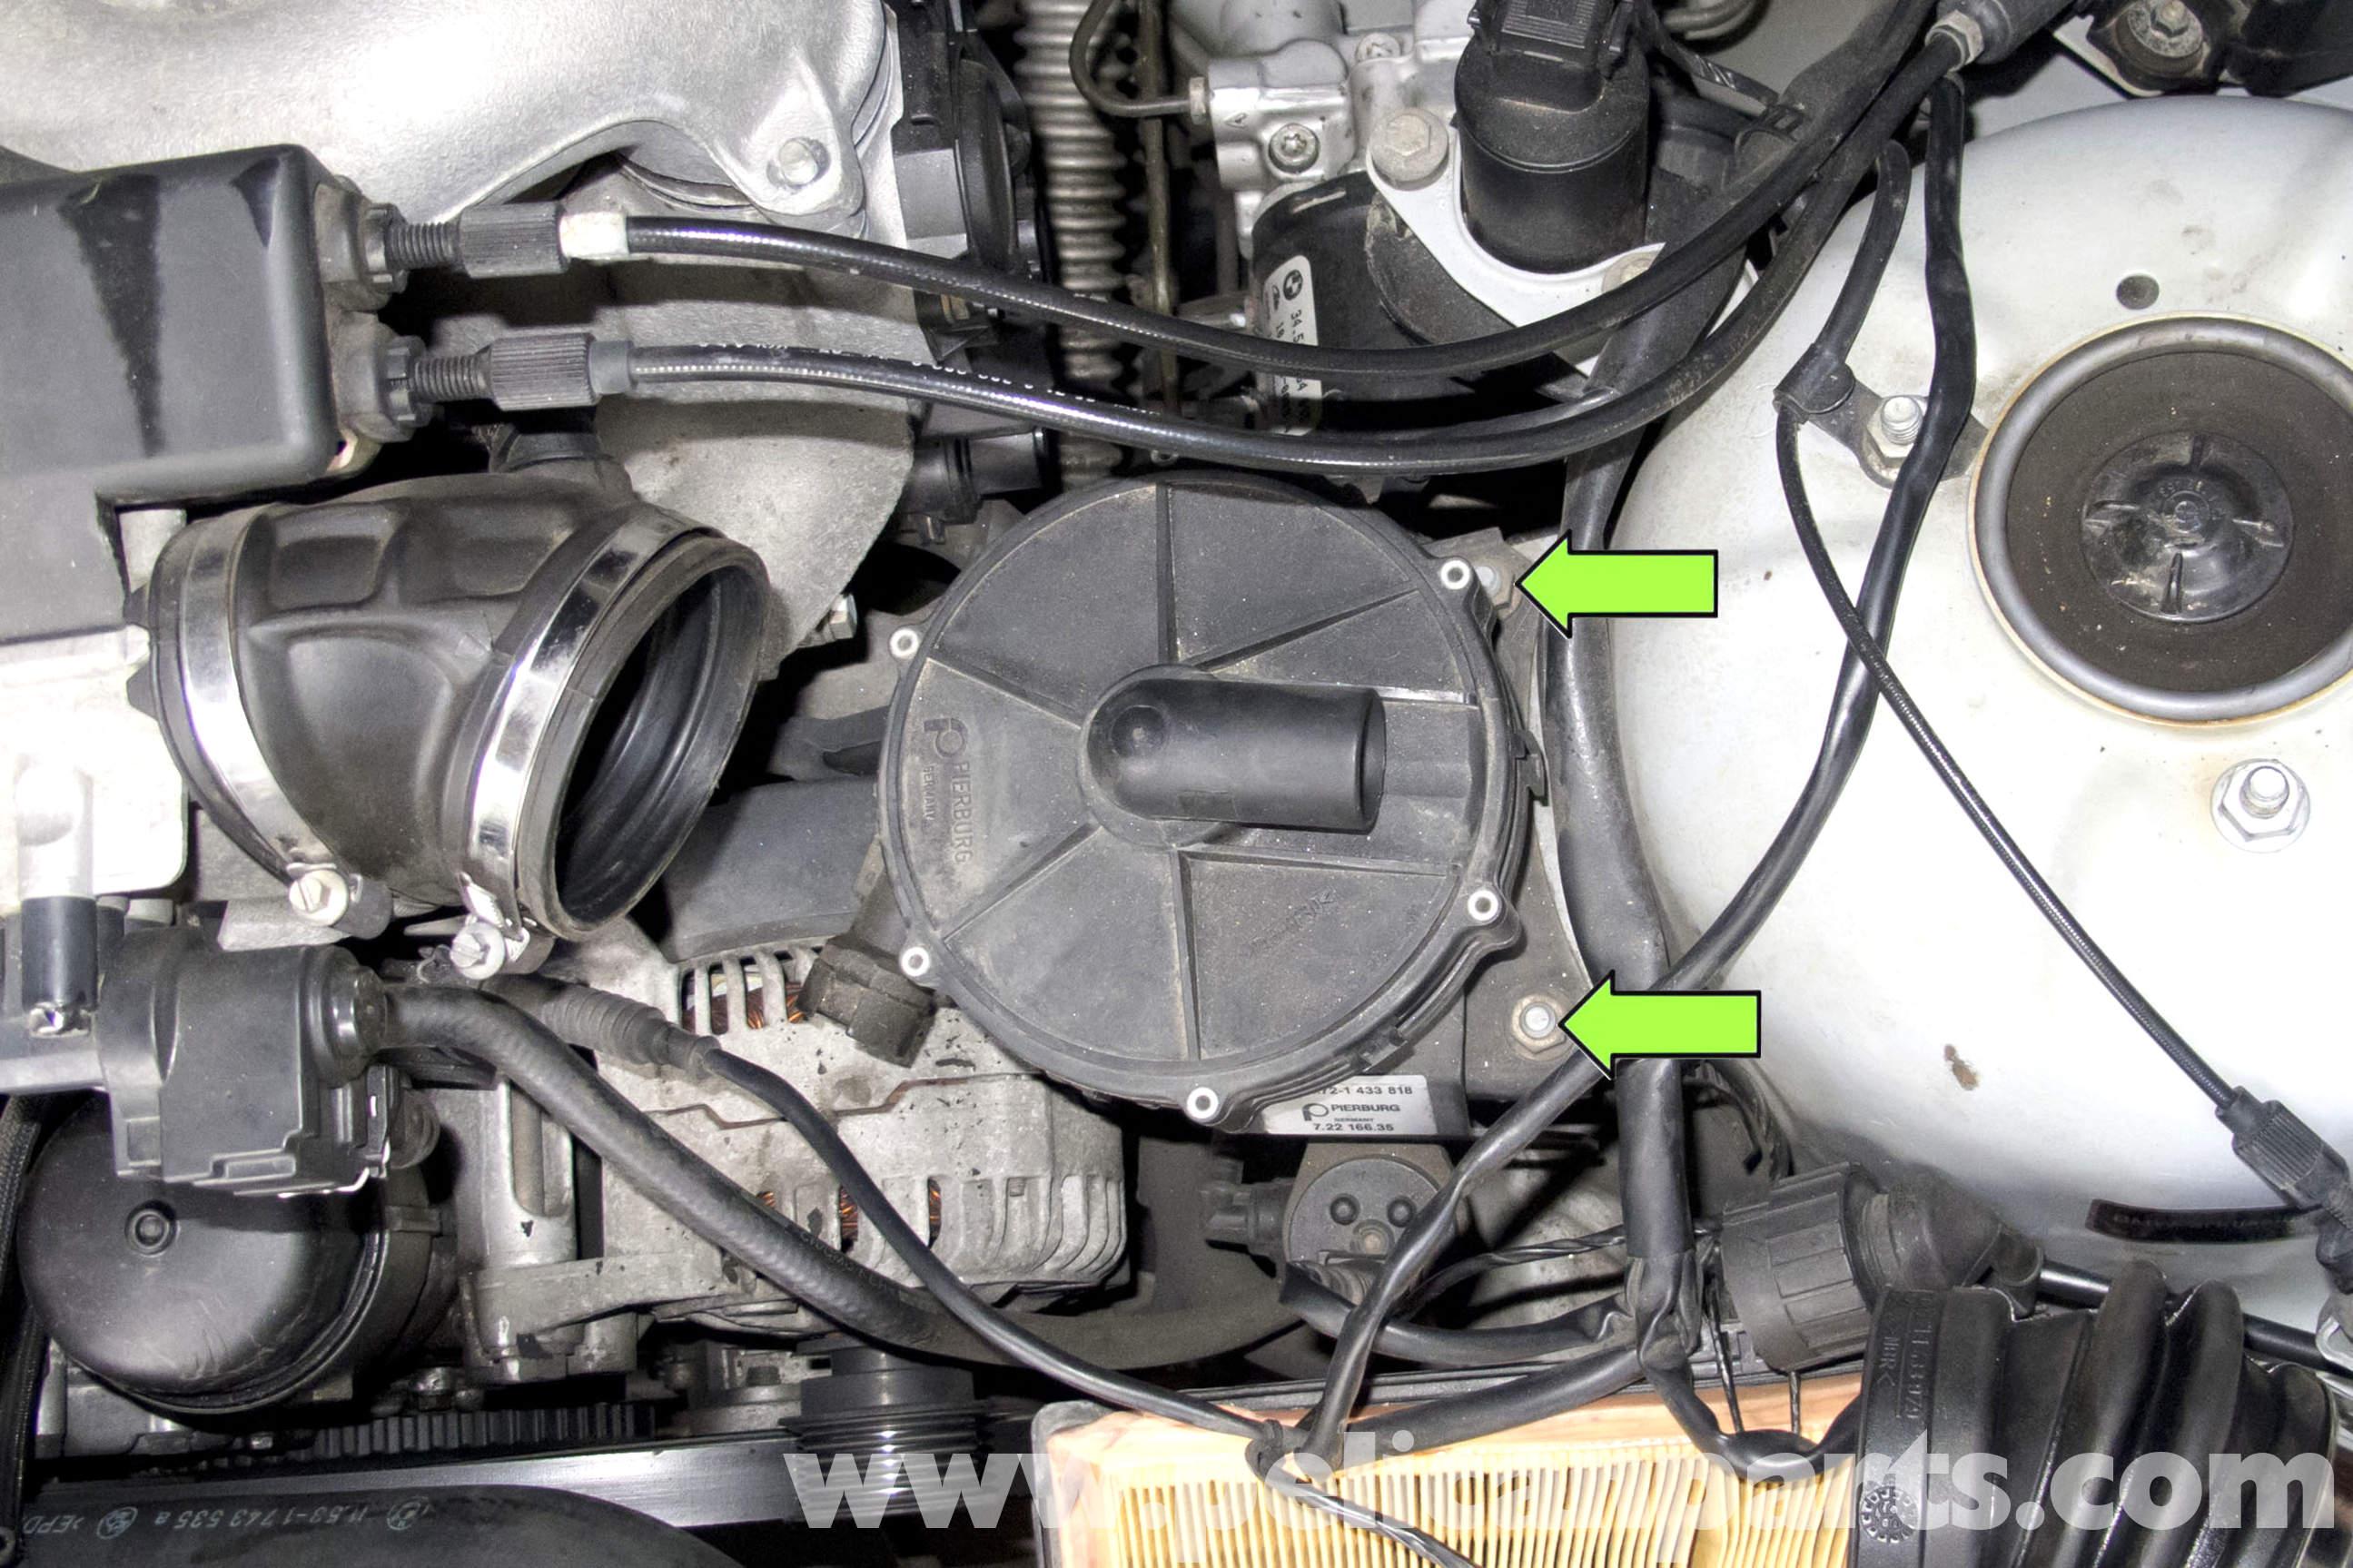 bmw z3 alternator replacement 1996 2002 pelican parts diy rh pelicanparts com 2003 BMW 325I Cooling System Diagram BMW M54 Coolant Flow Diagram